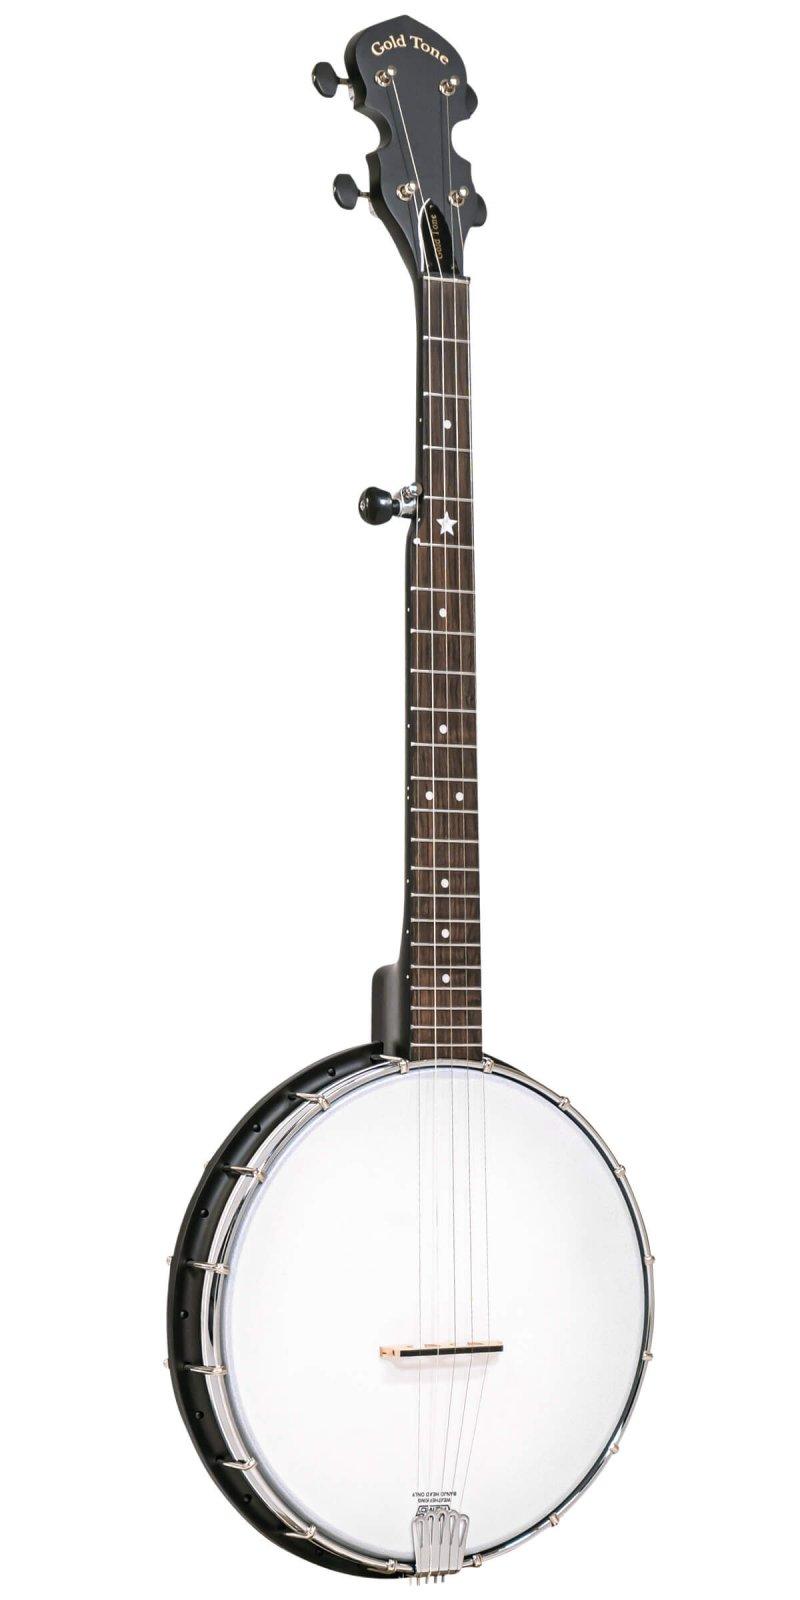 Gold Tone - AC Traveler Open Back Composite Banjo